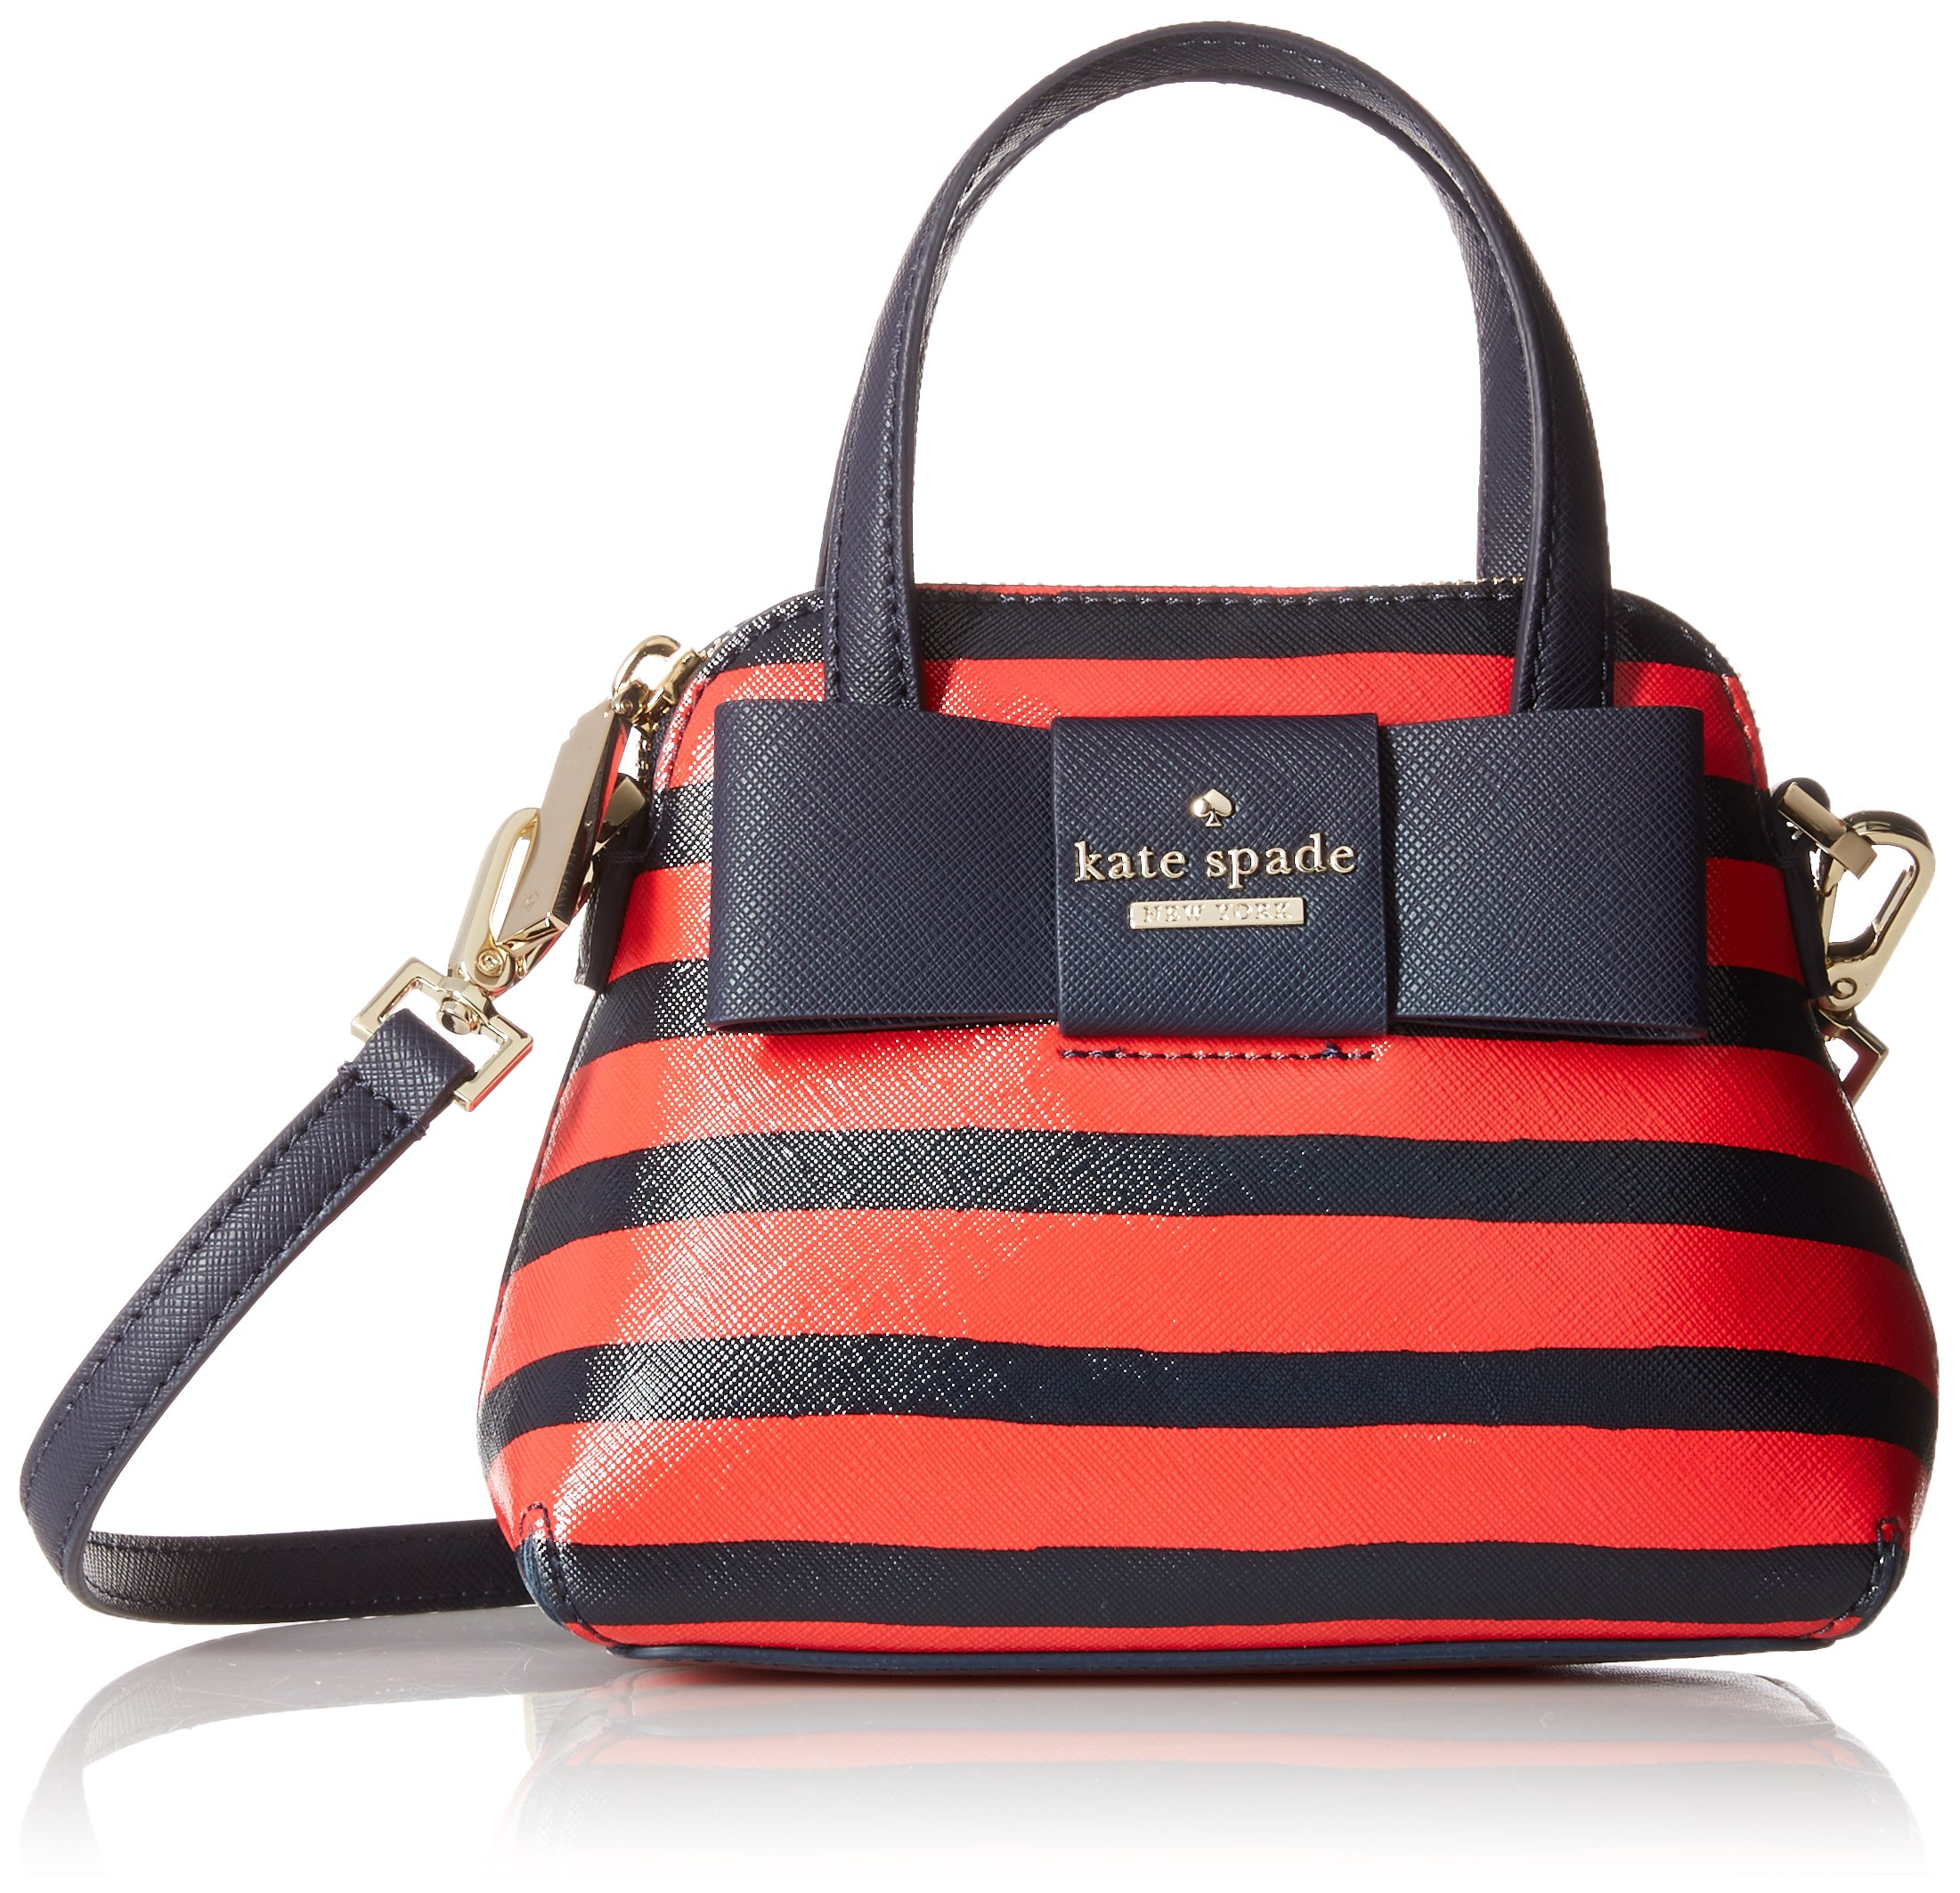 kate spade new york Julia Street Stripe Mini Maise Cross Body Bag, Rich Navy/Cherry Liqueur, One Size by Kate Spade New York